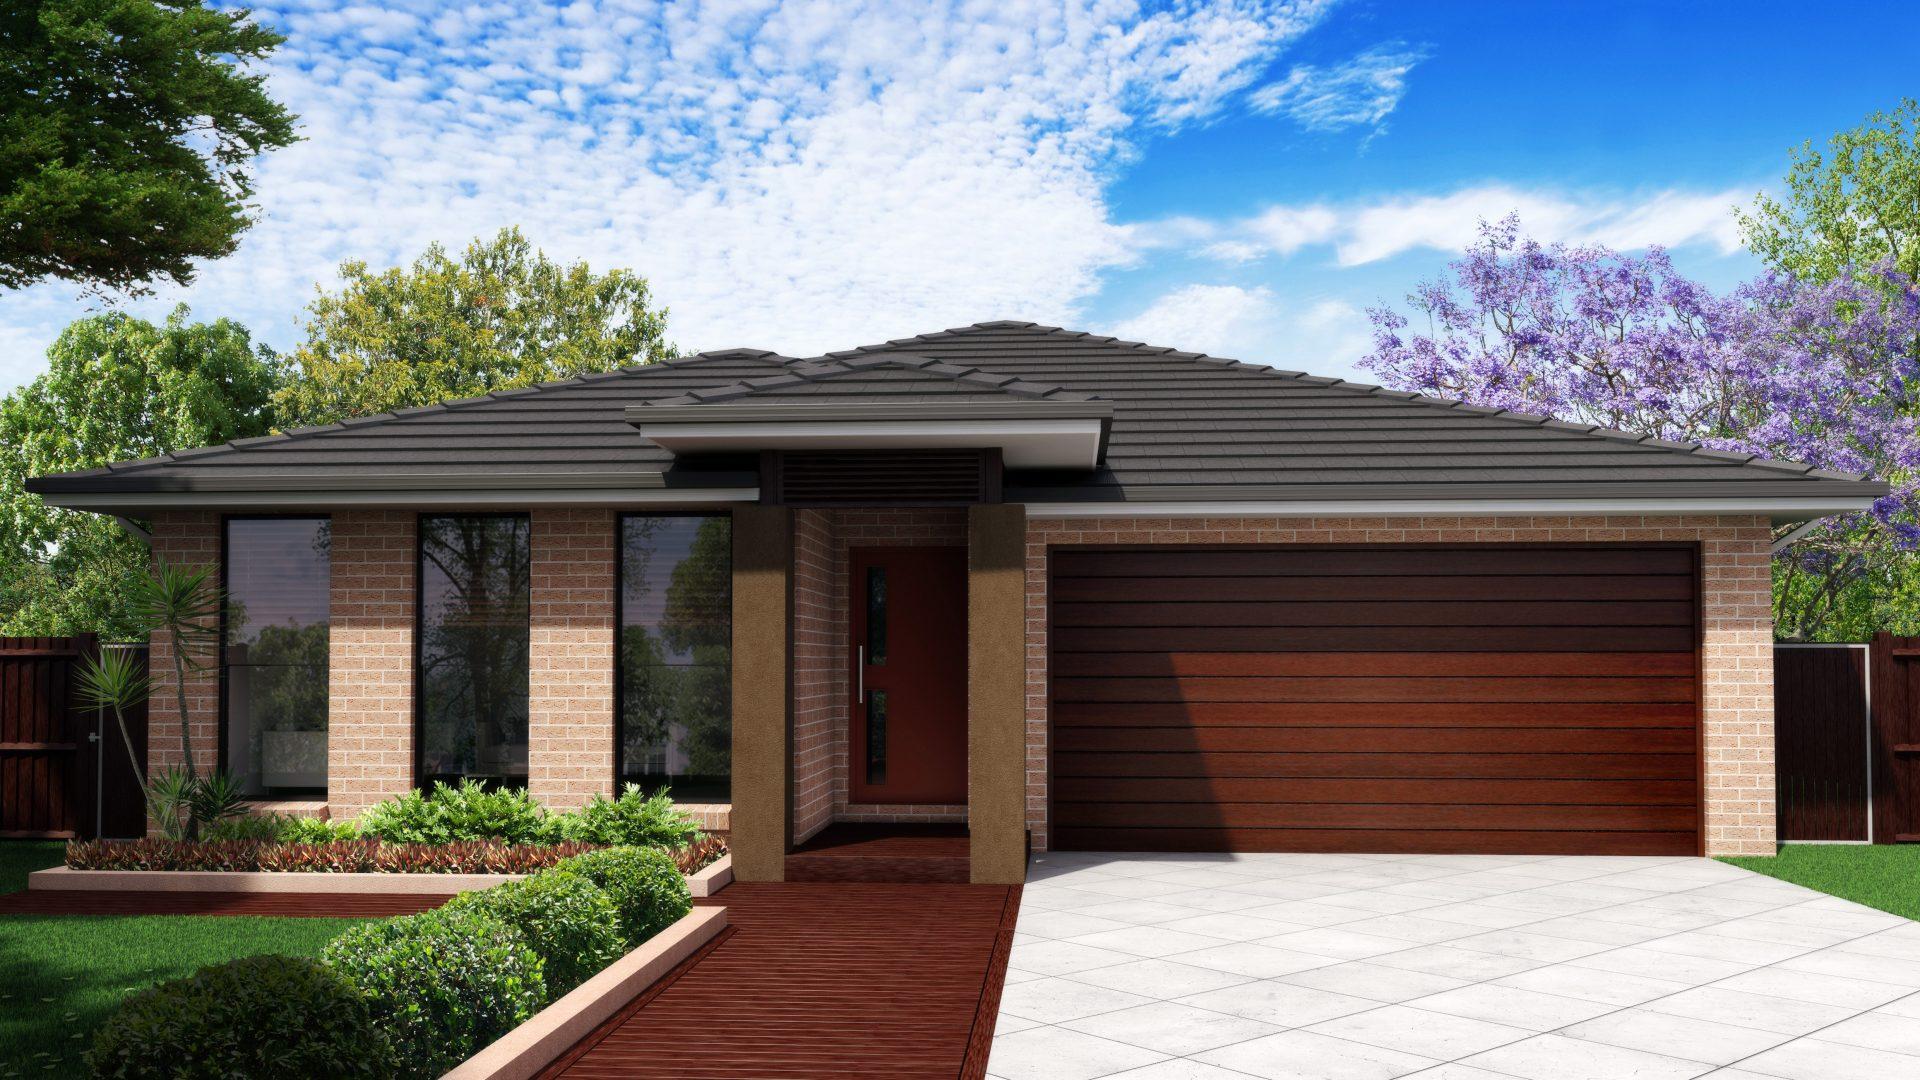 Esprit 26 Trend Facade Jandson Homes